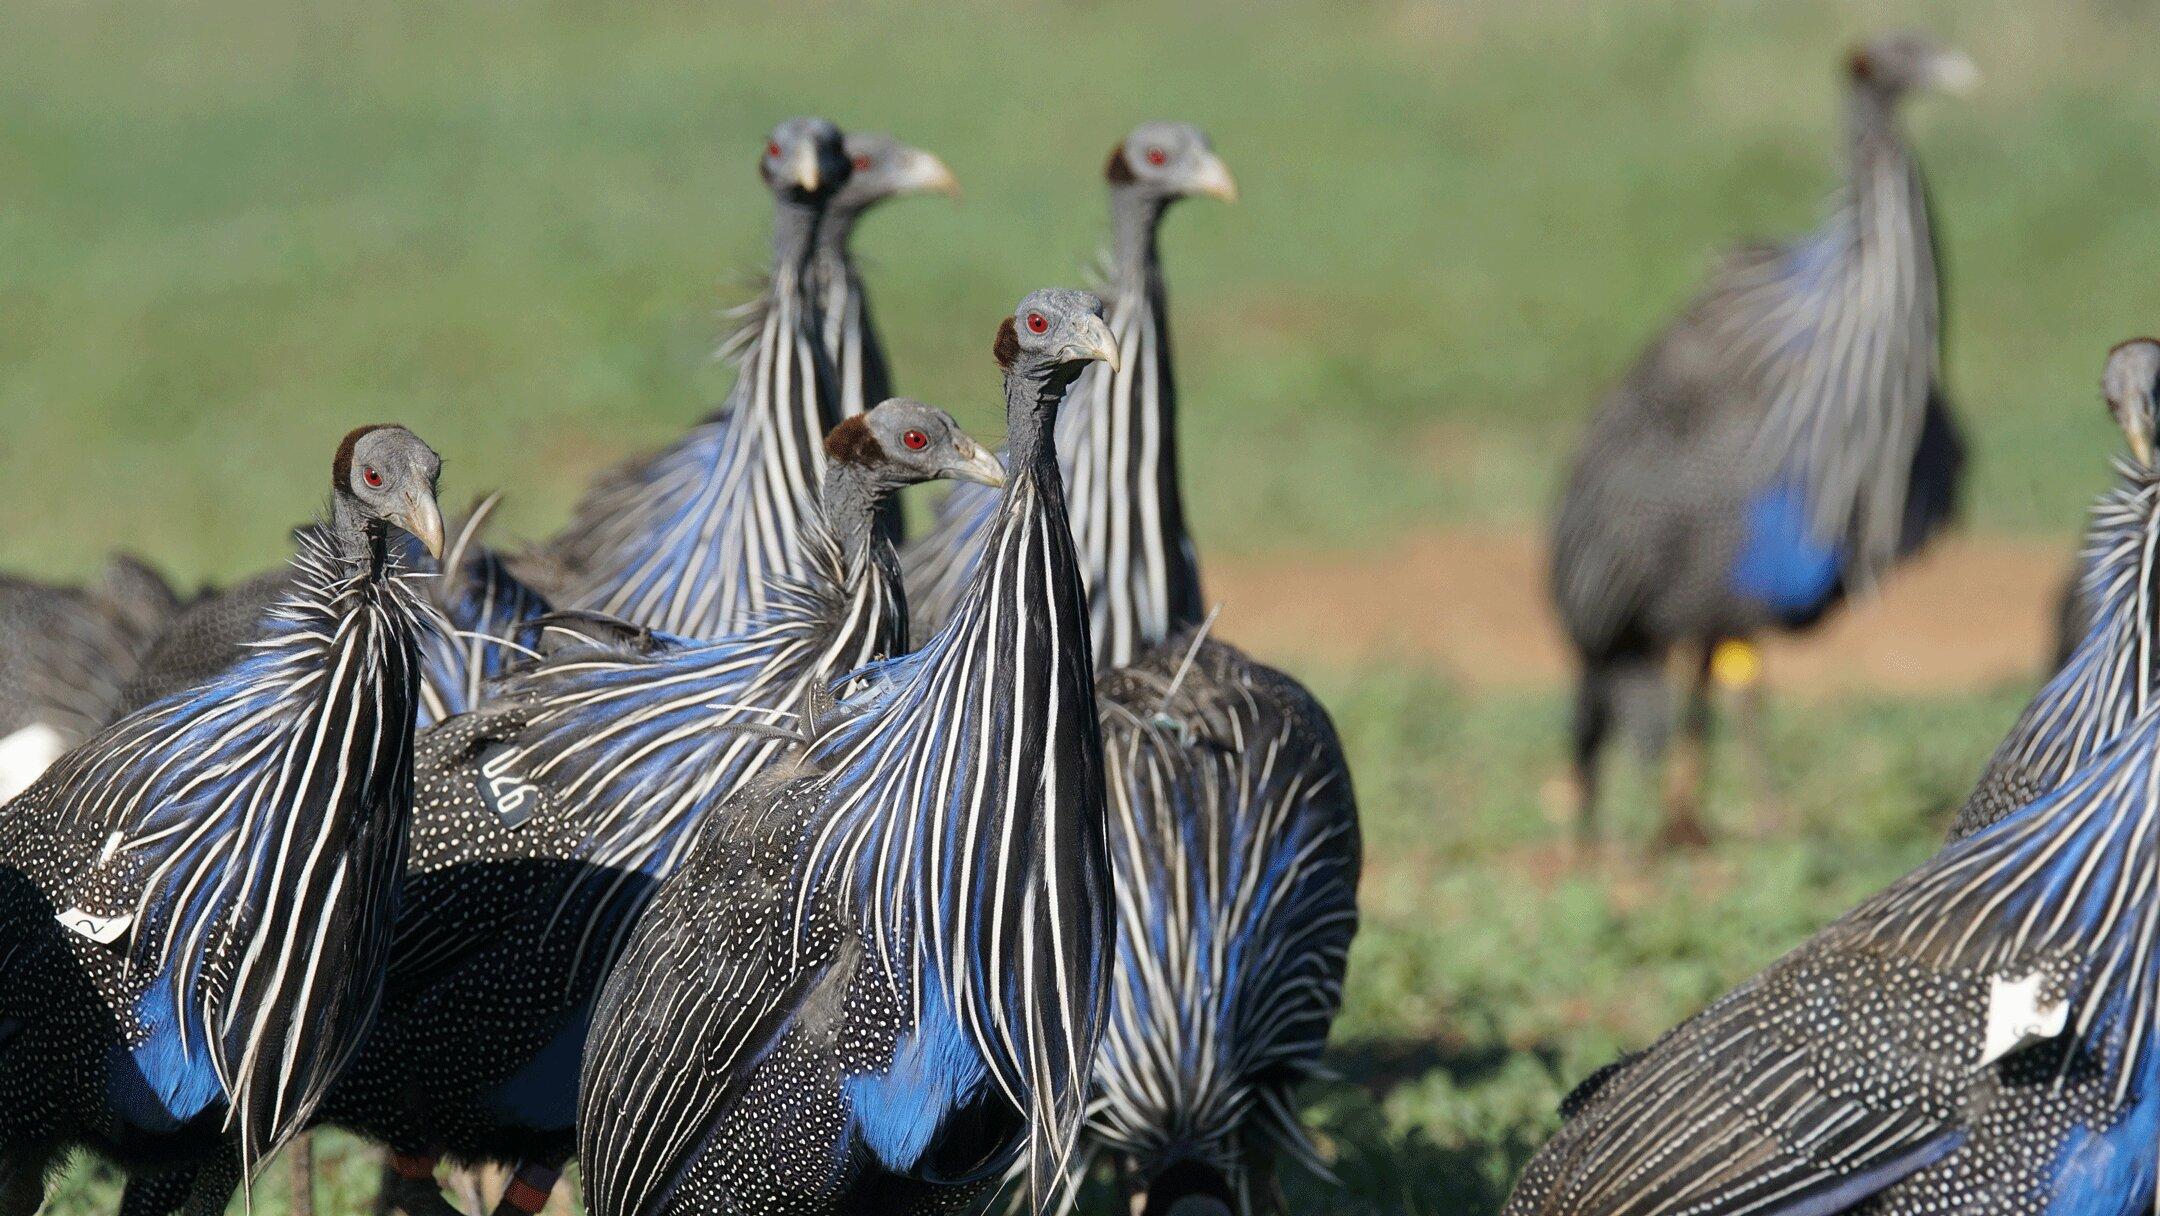 Vulturine guineafowl move across the landscape in large groups. (James Klarevas)